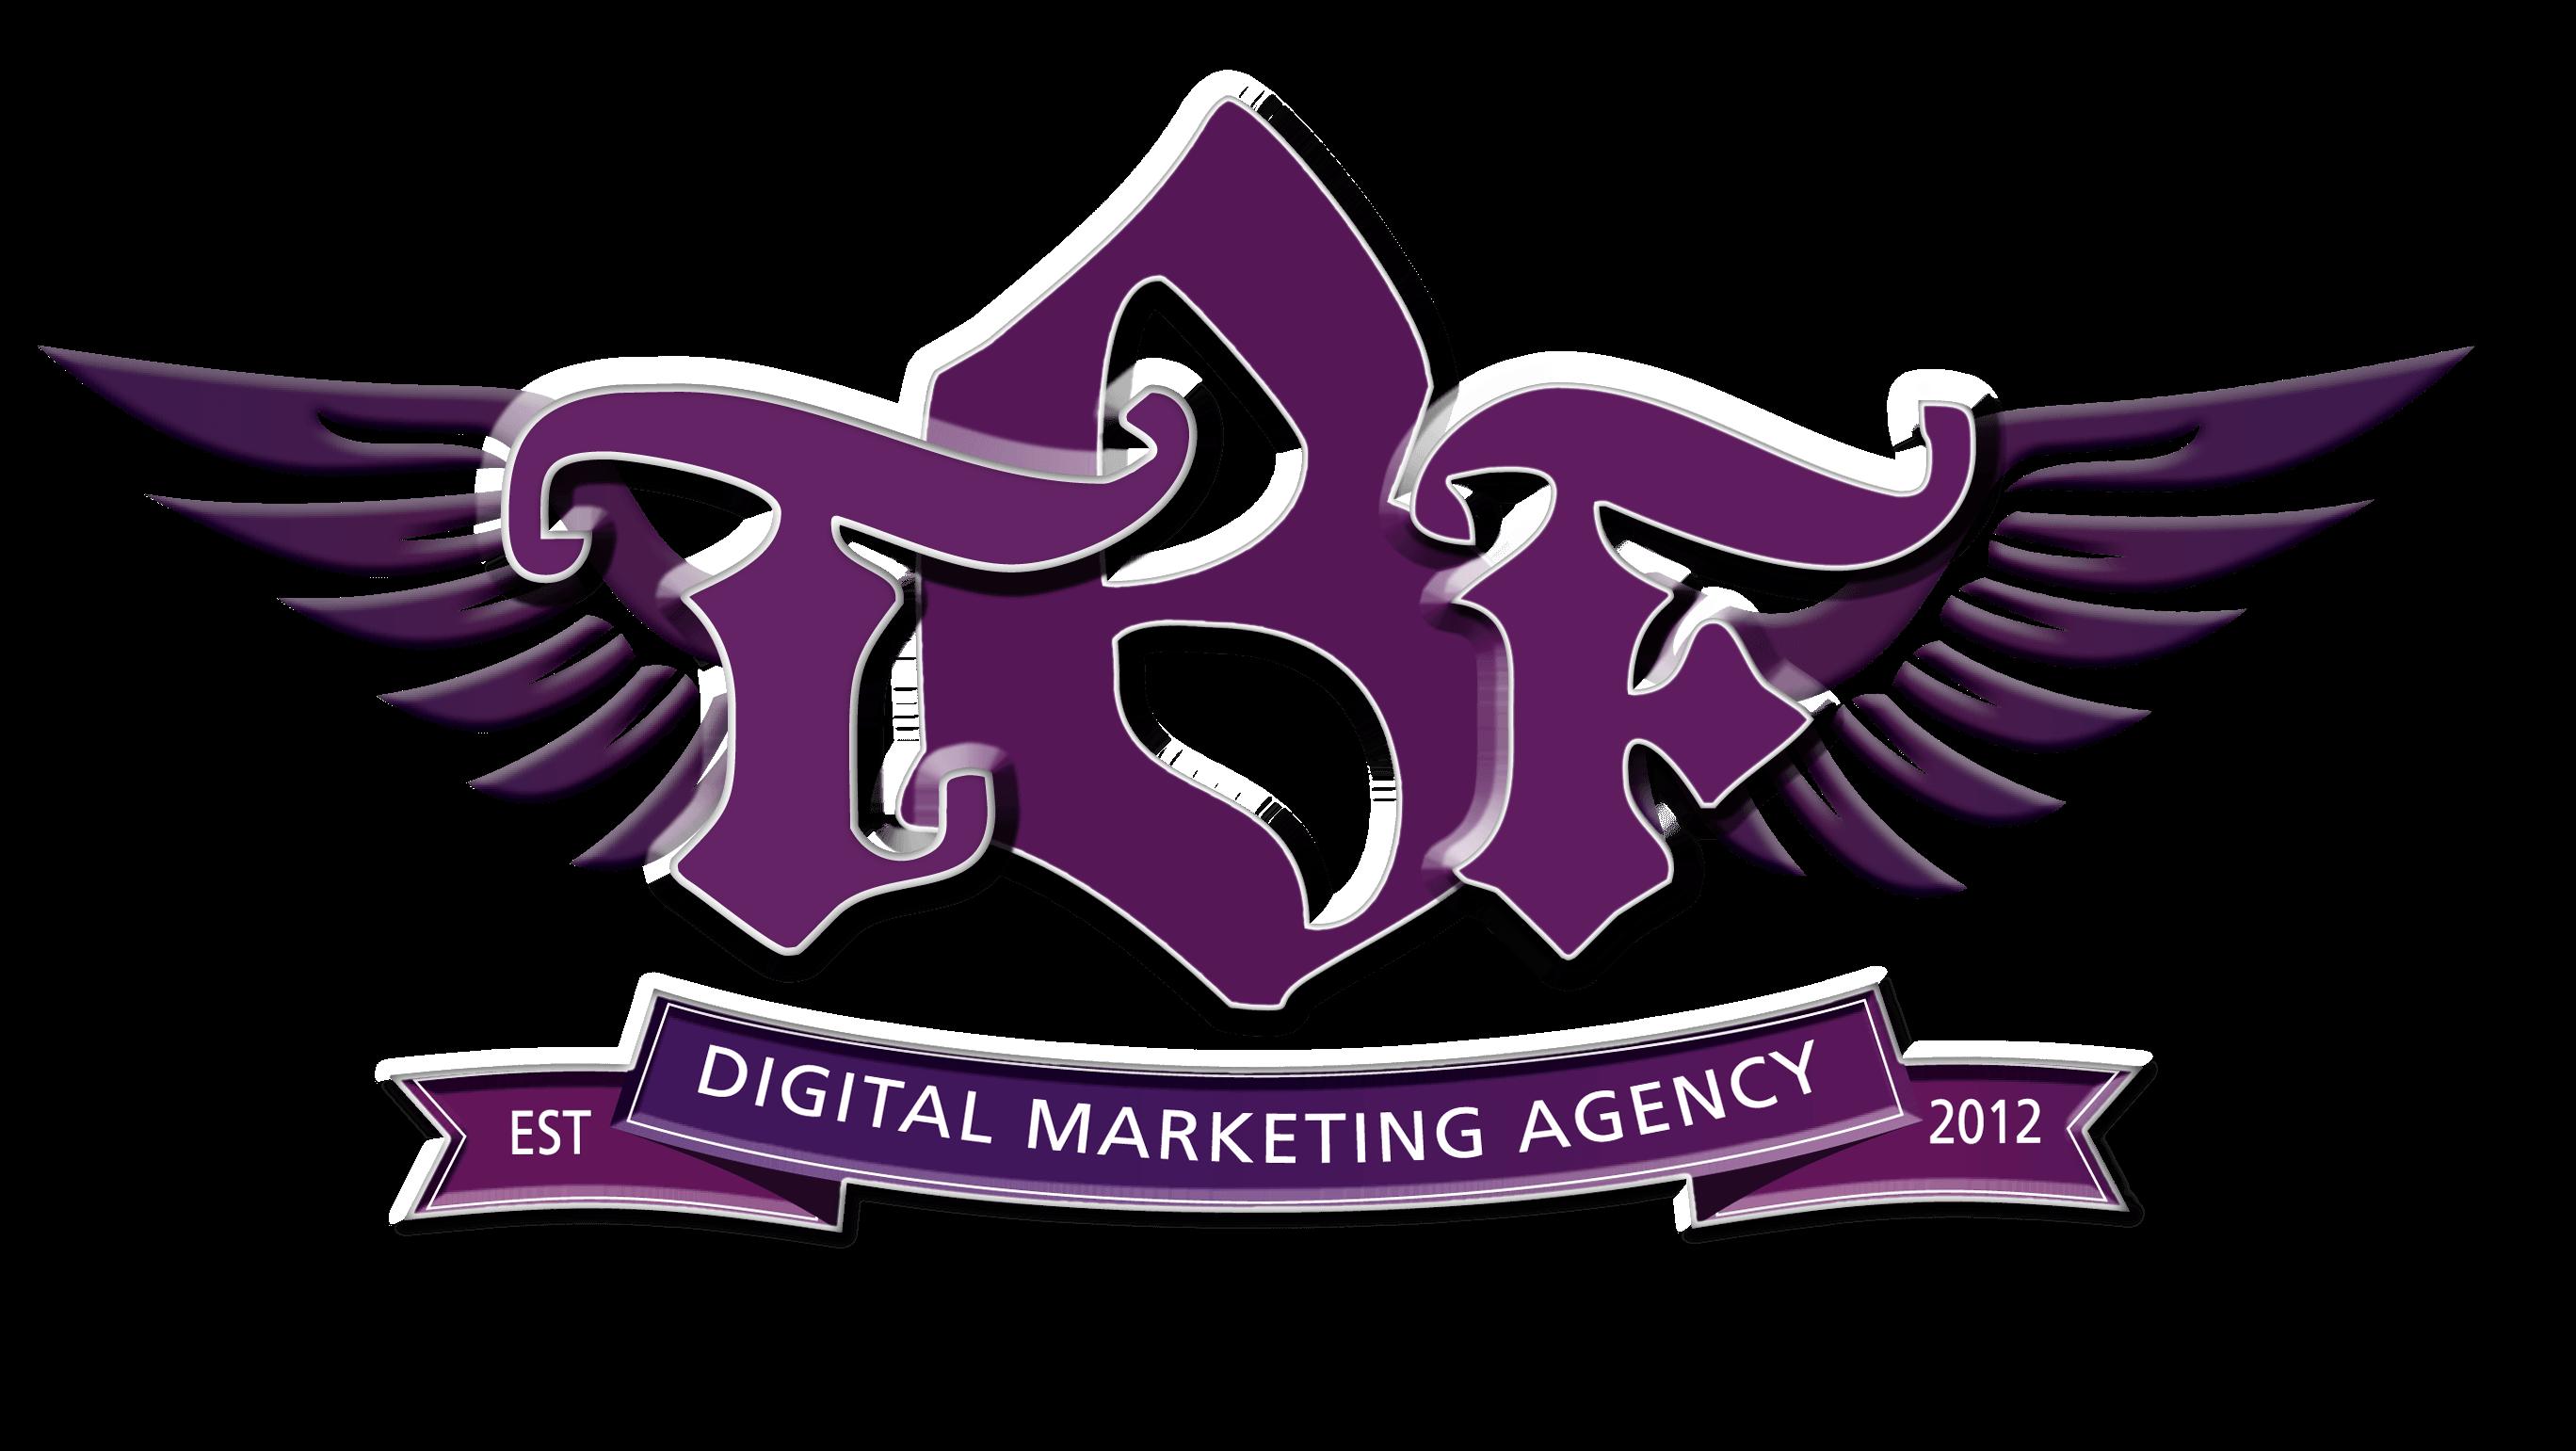 Digital Marketing Agency - The Business Fairy Digital Marketing Agency